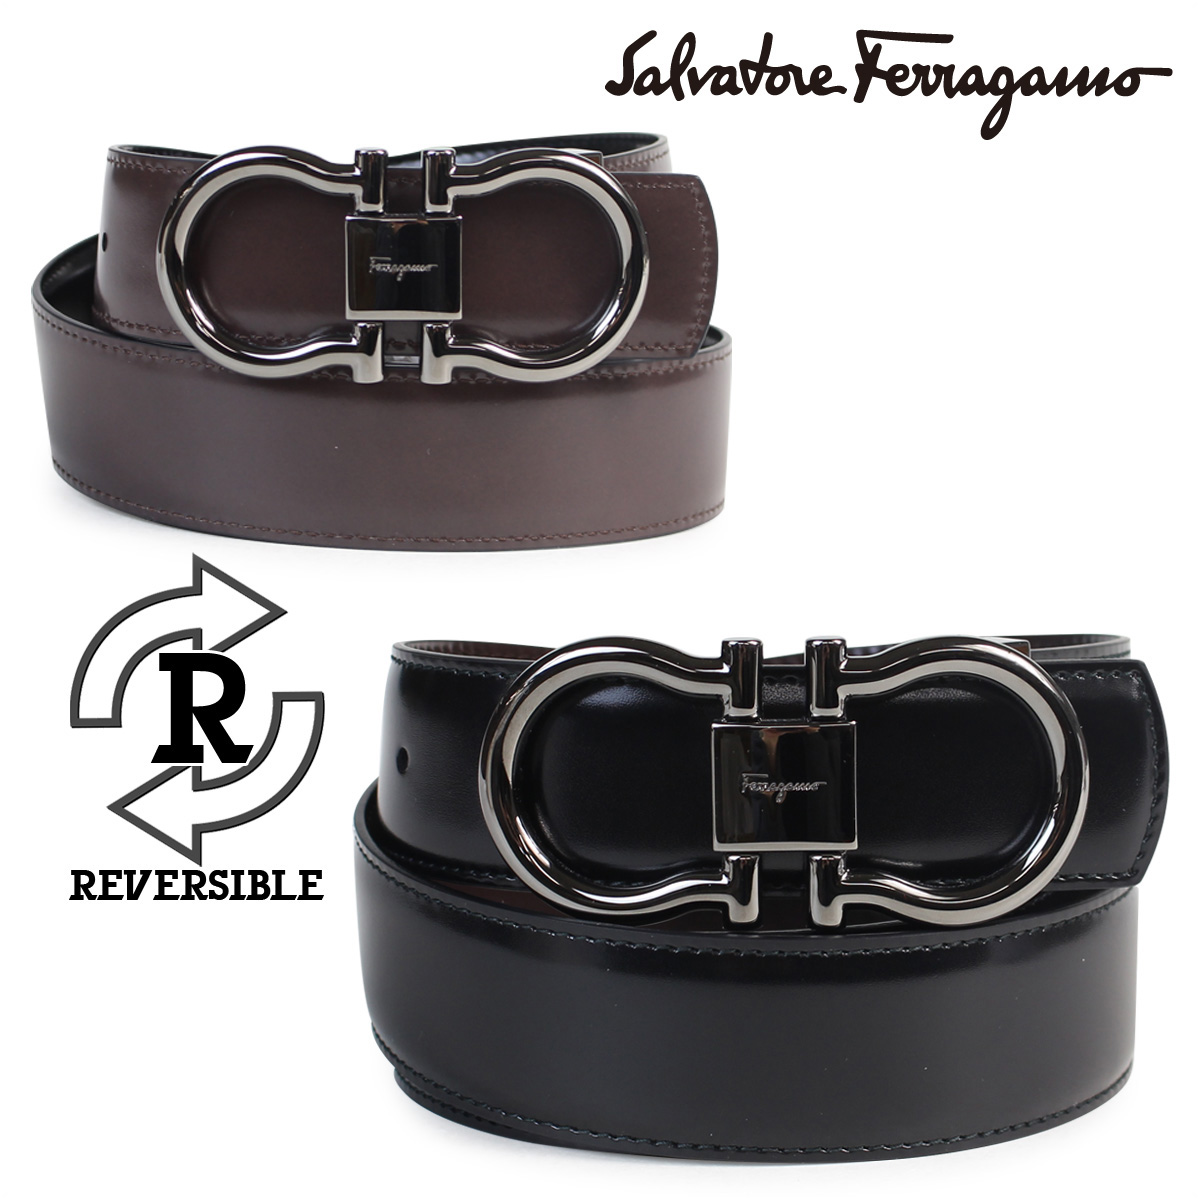 b28df65134f ... online 5f560 8d20a  cheapest ferragamo belt men genuine leather  salvatore ferragamo wedding ceremony 3 6 shinnyu load dca02 61c46